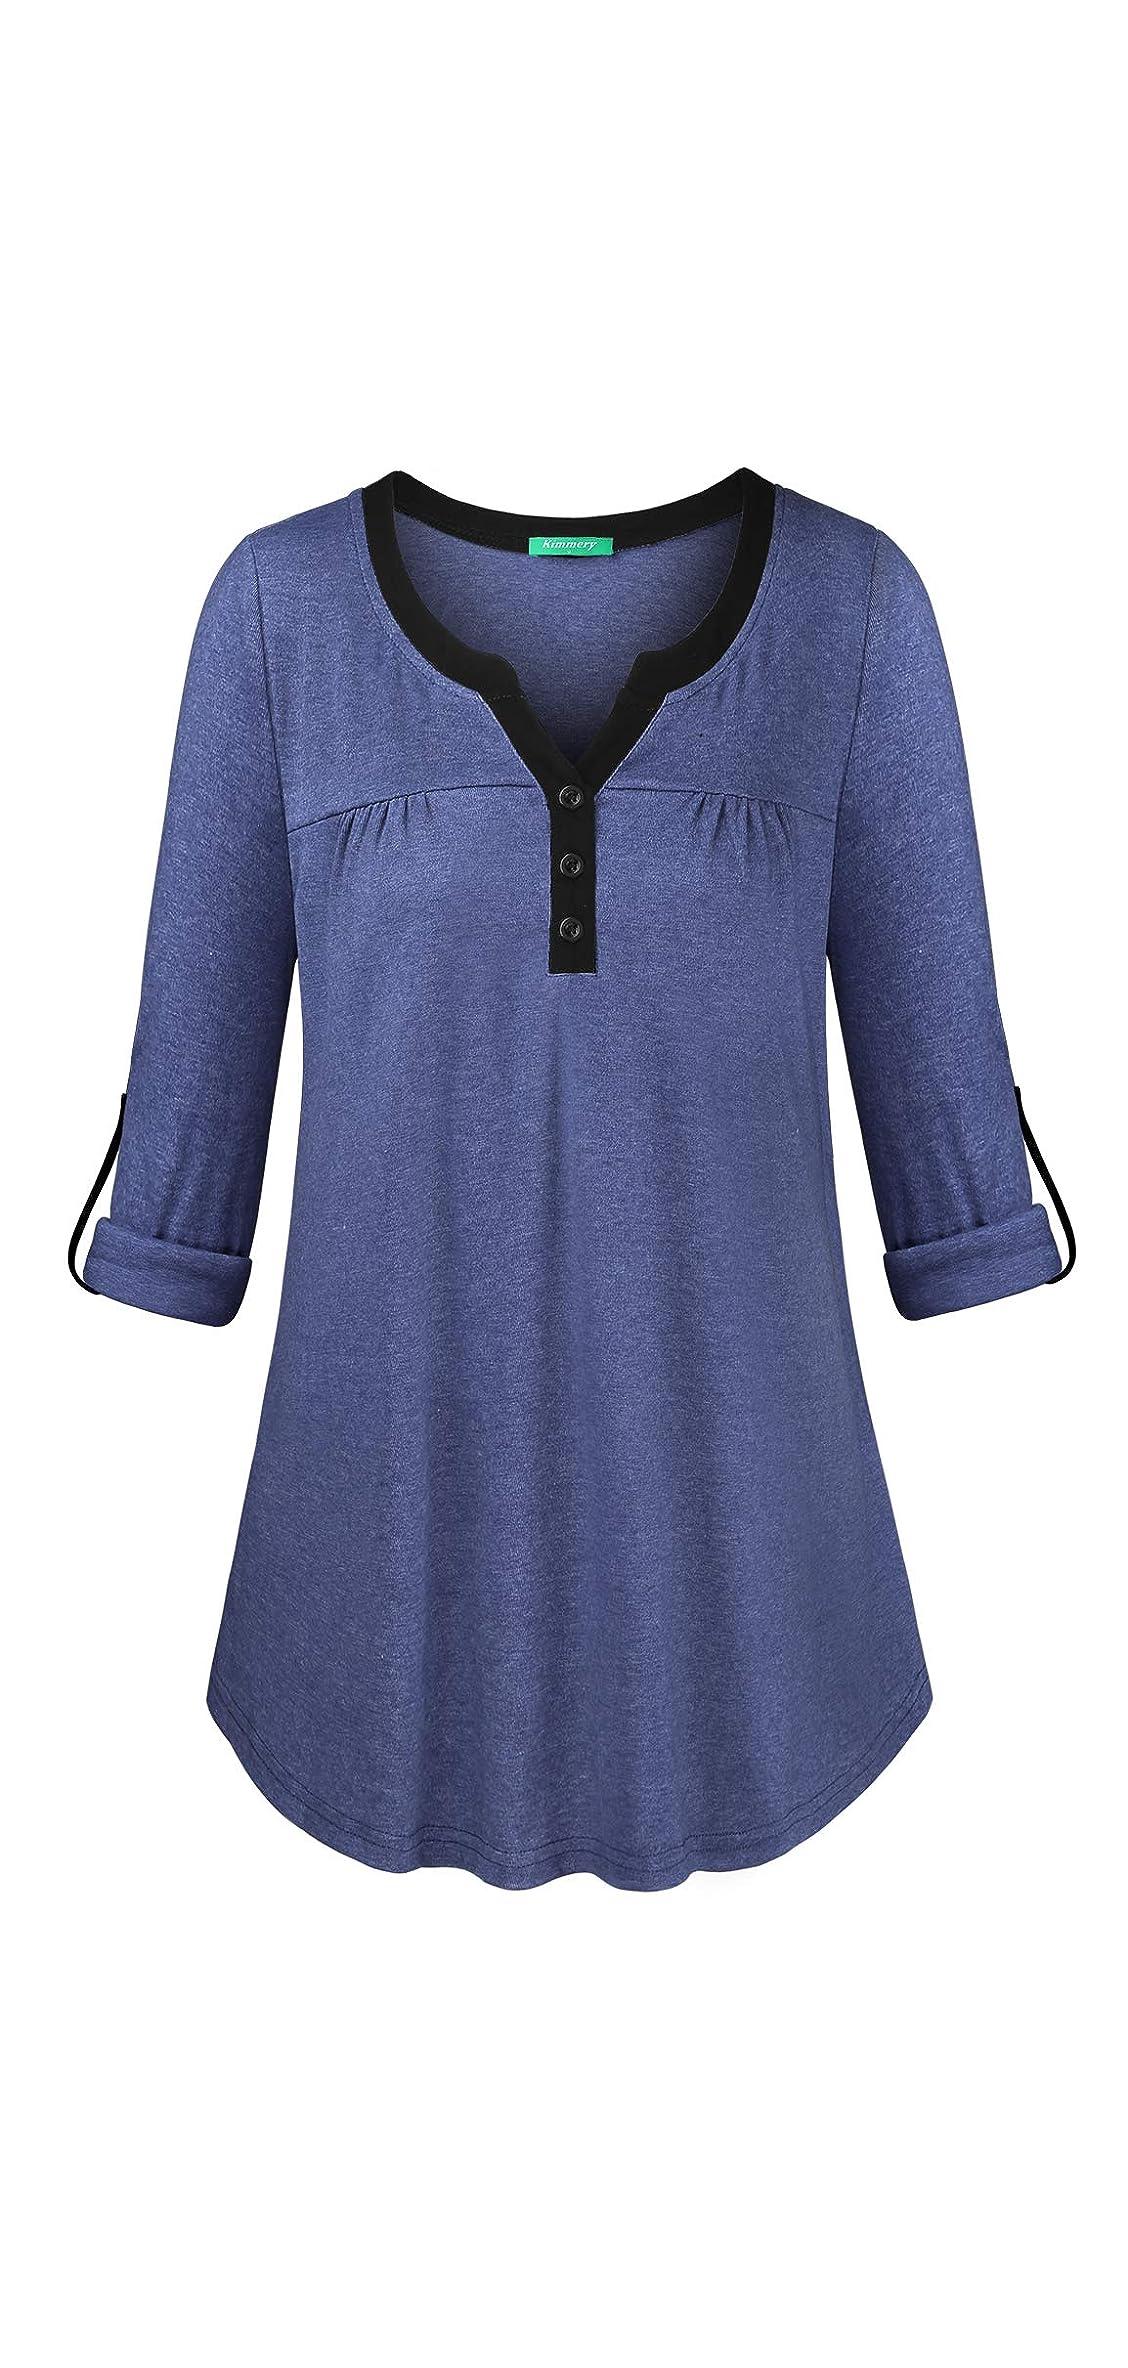 Kimmery Woman Henley Shirt Cuffed Sleeve Notch V Neck Casual